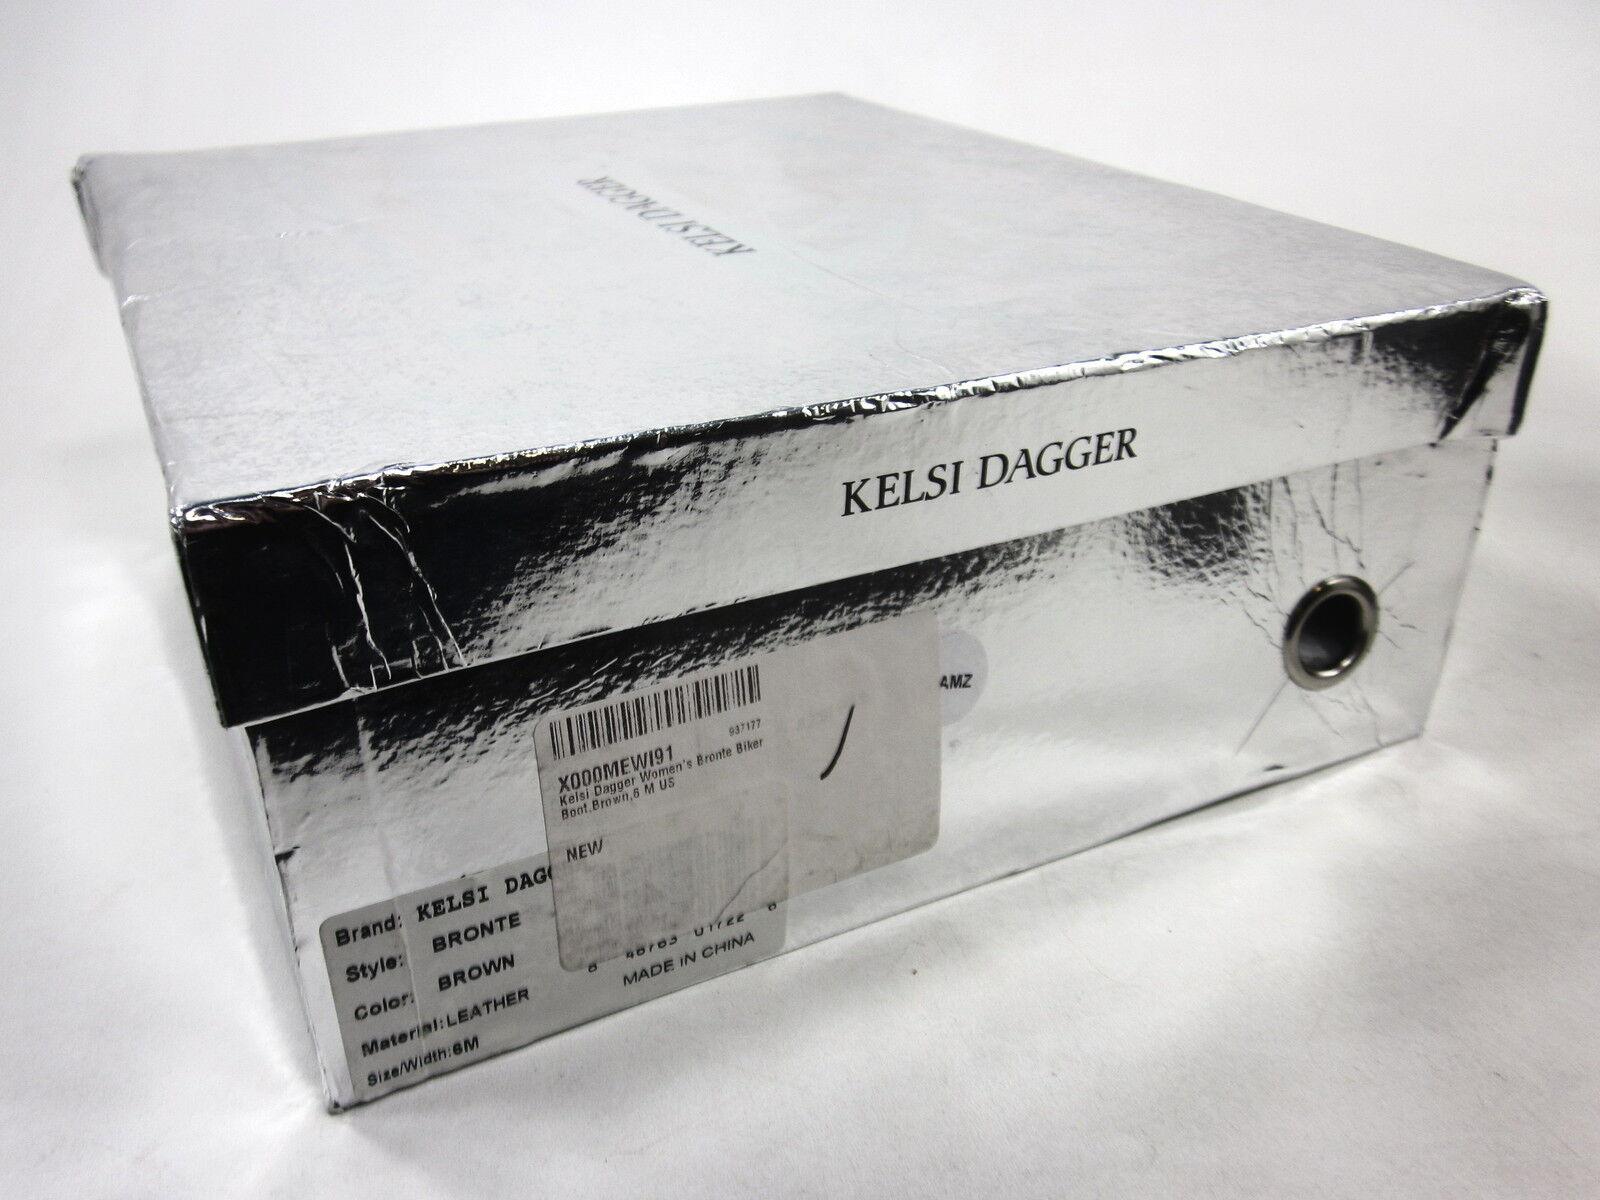 KELSI DAGGER, BRONTE BIKER BOOTS, BROWN, WOMENS, US 6 M, EURO 36, NEW IN BOX